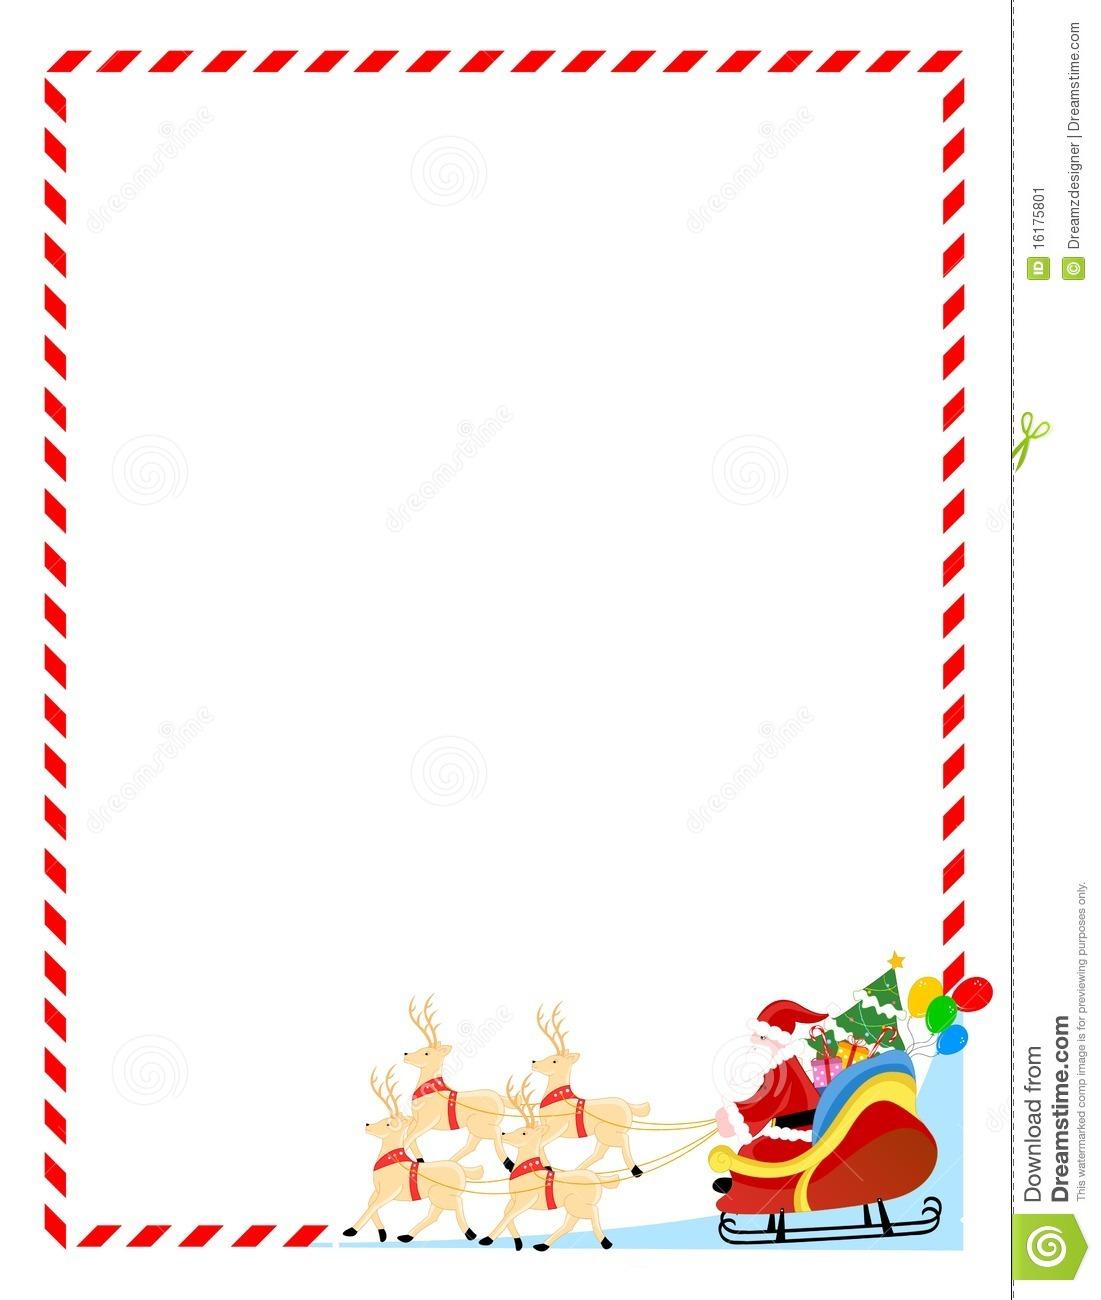 Santa Letter Background Template Golon Wpart Co